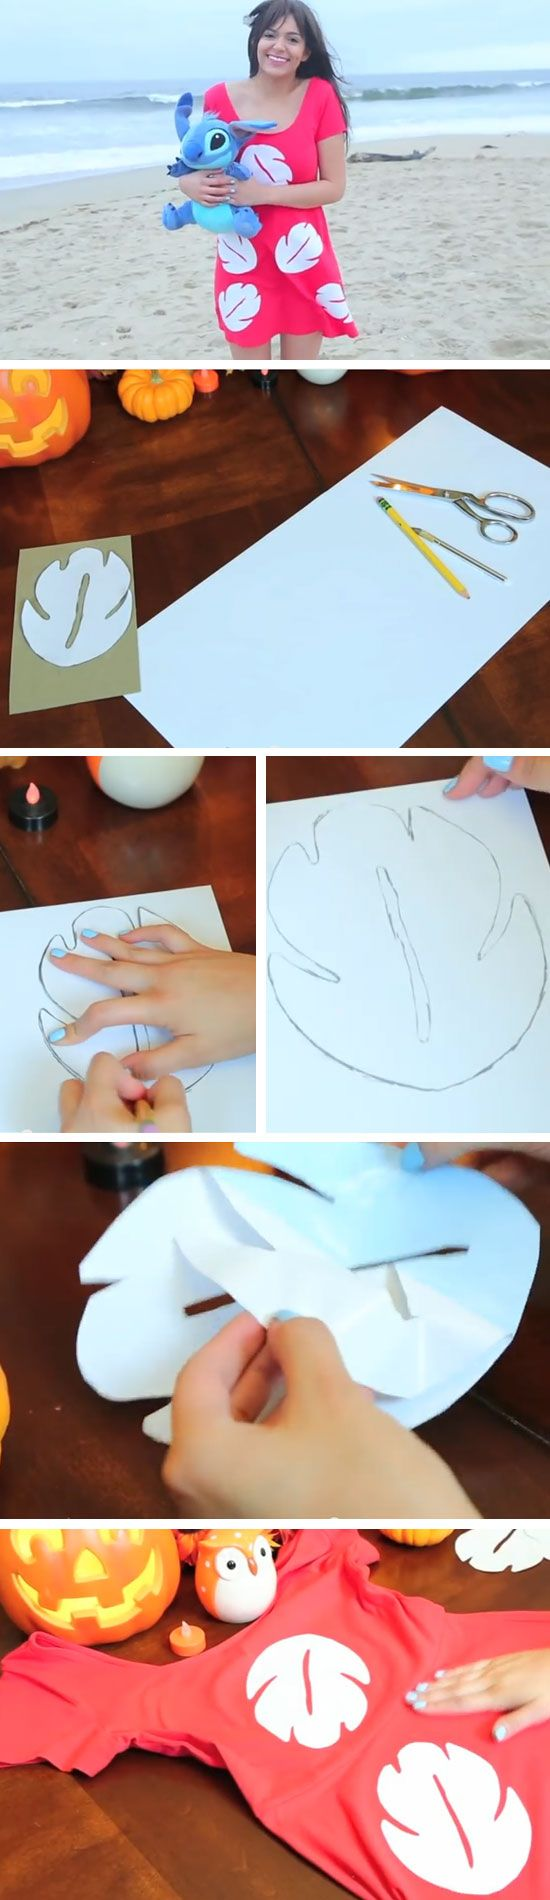 Last Minute DIY Halloween Costumes for Teens | Lilo